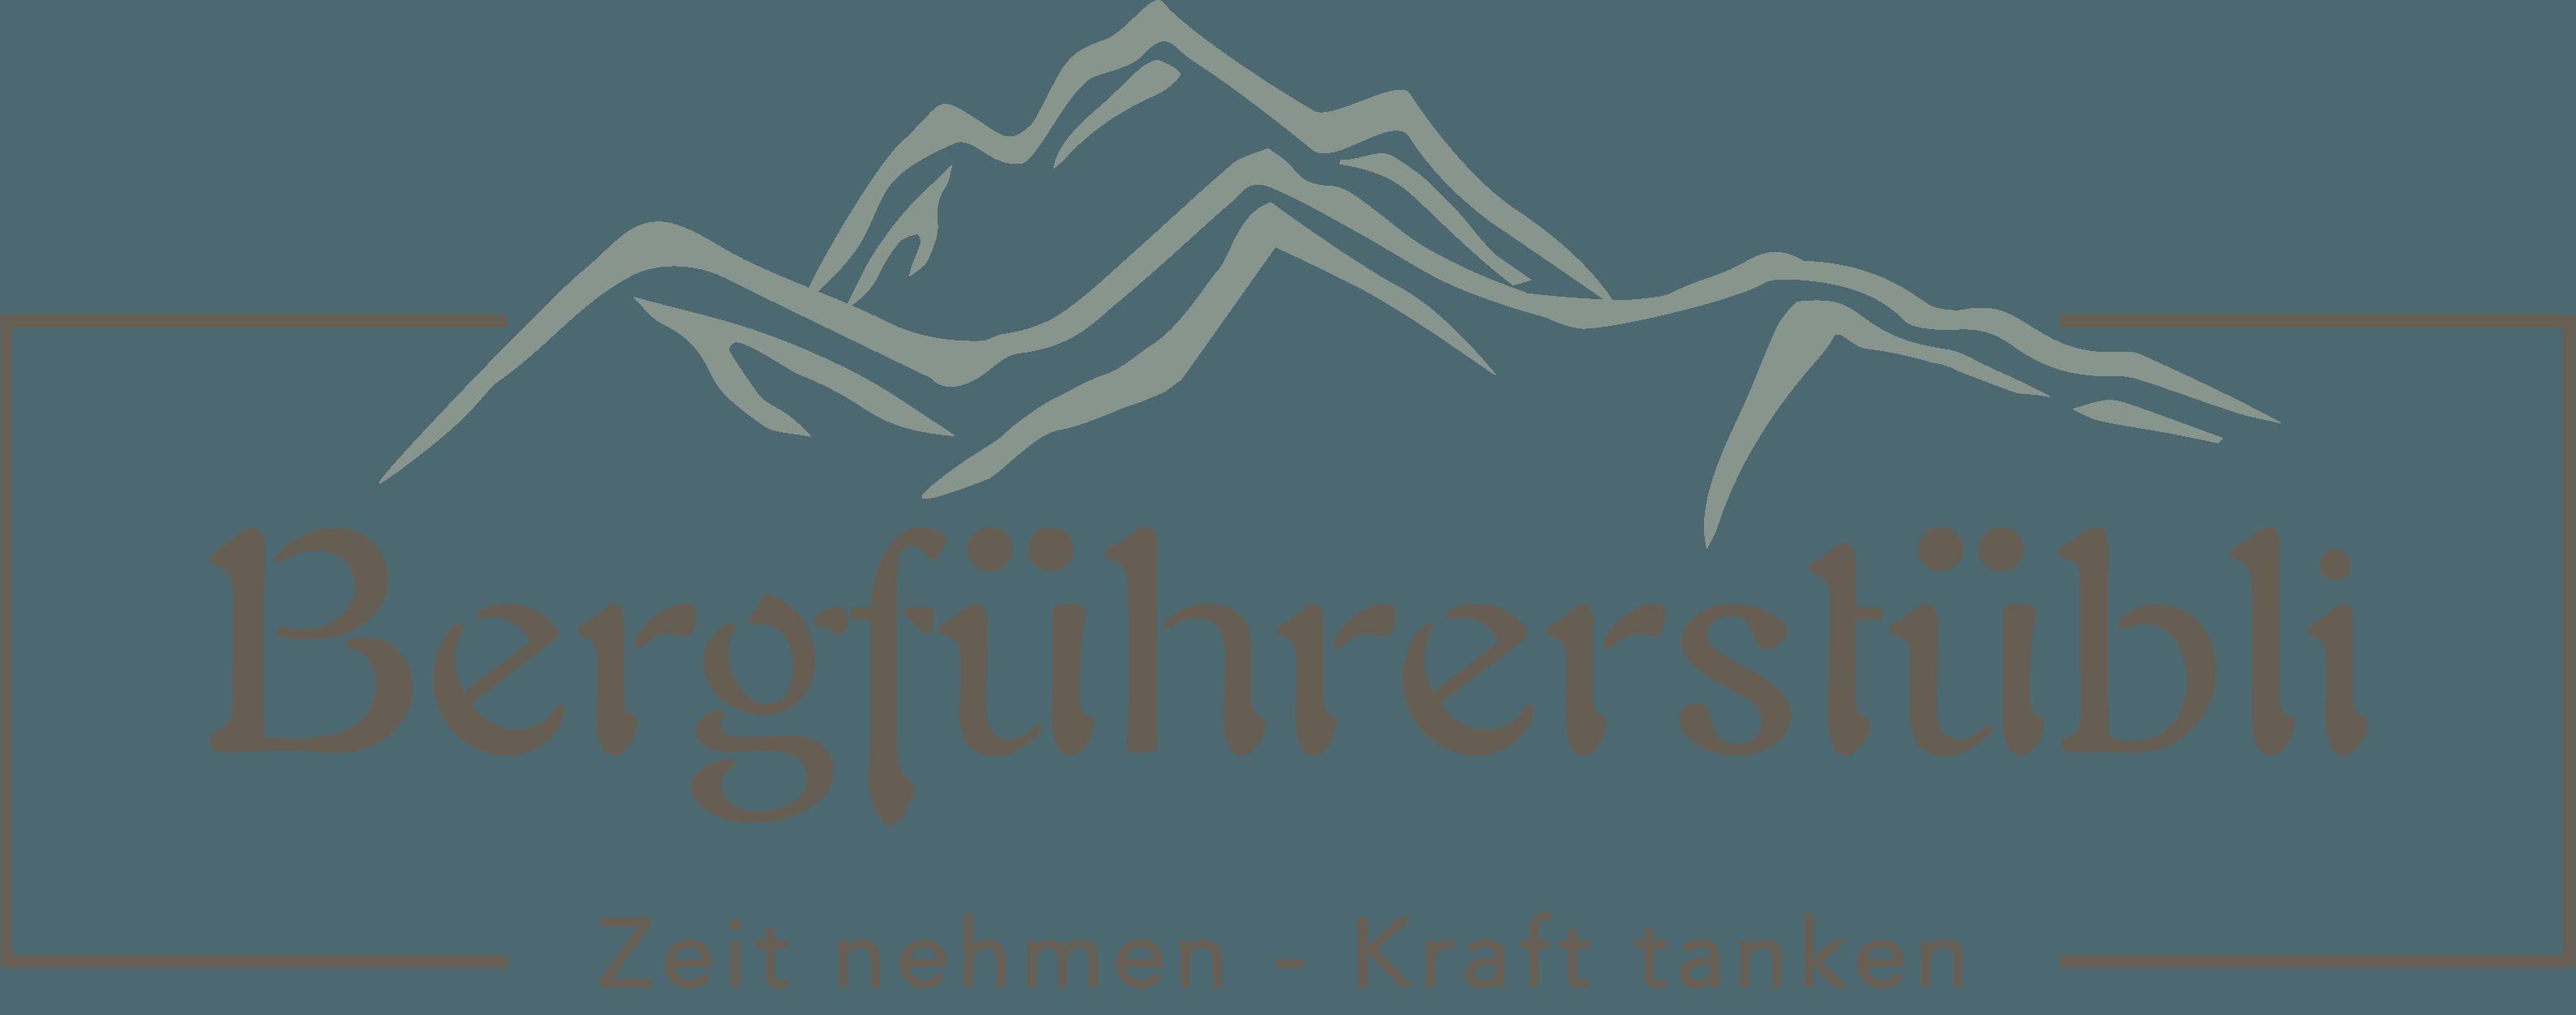 Bergführerstübli